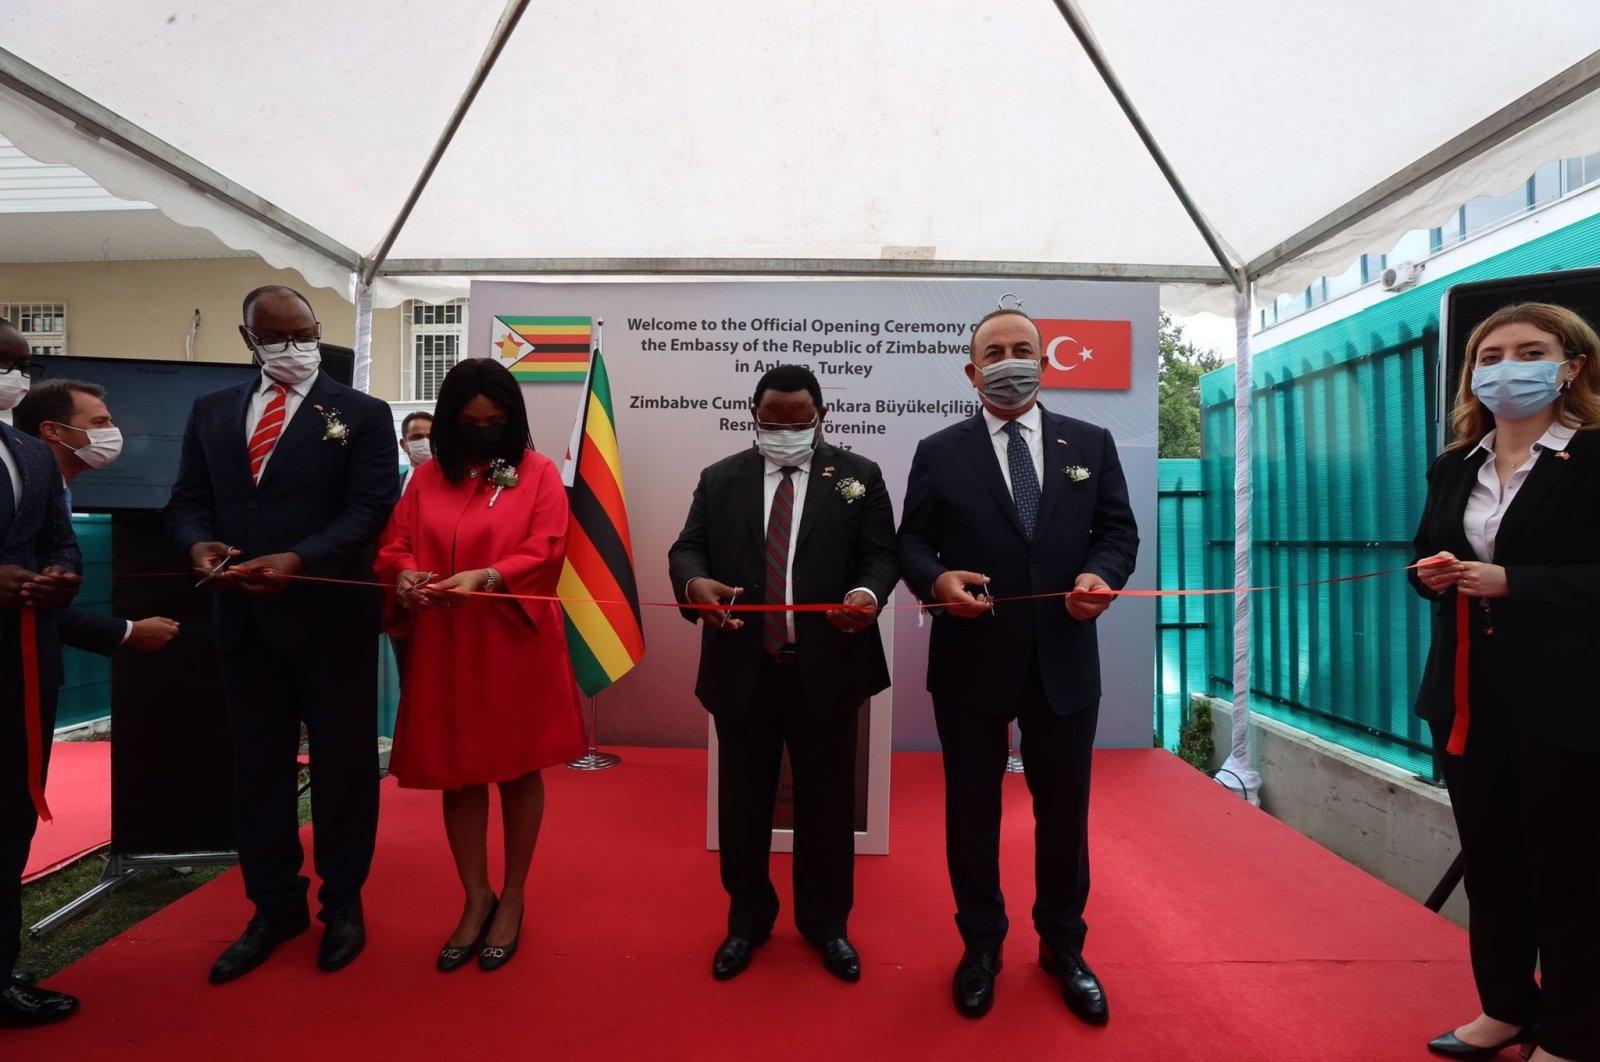 Foreign Minister Mevlüt Çavuşoğlu (R) attends the opening ceremony of the Zimbabwe Embassy in Ankara, Turkey, June 22, 2021. (AA Photo)